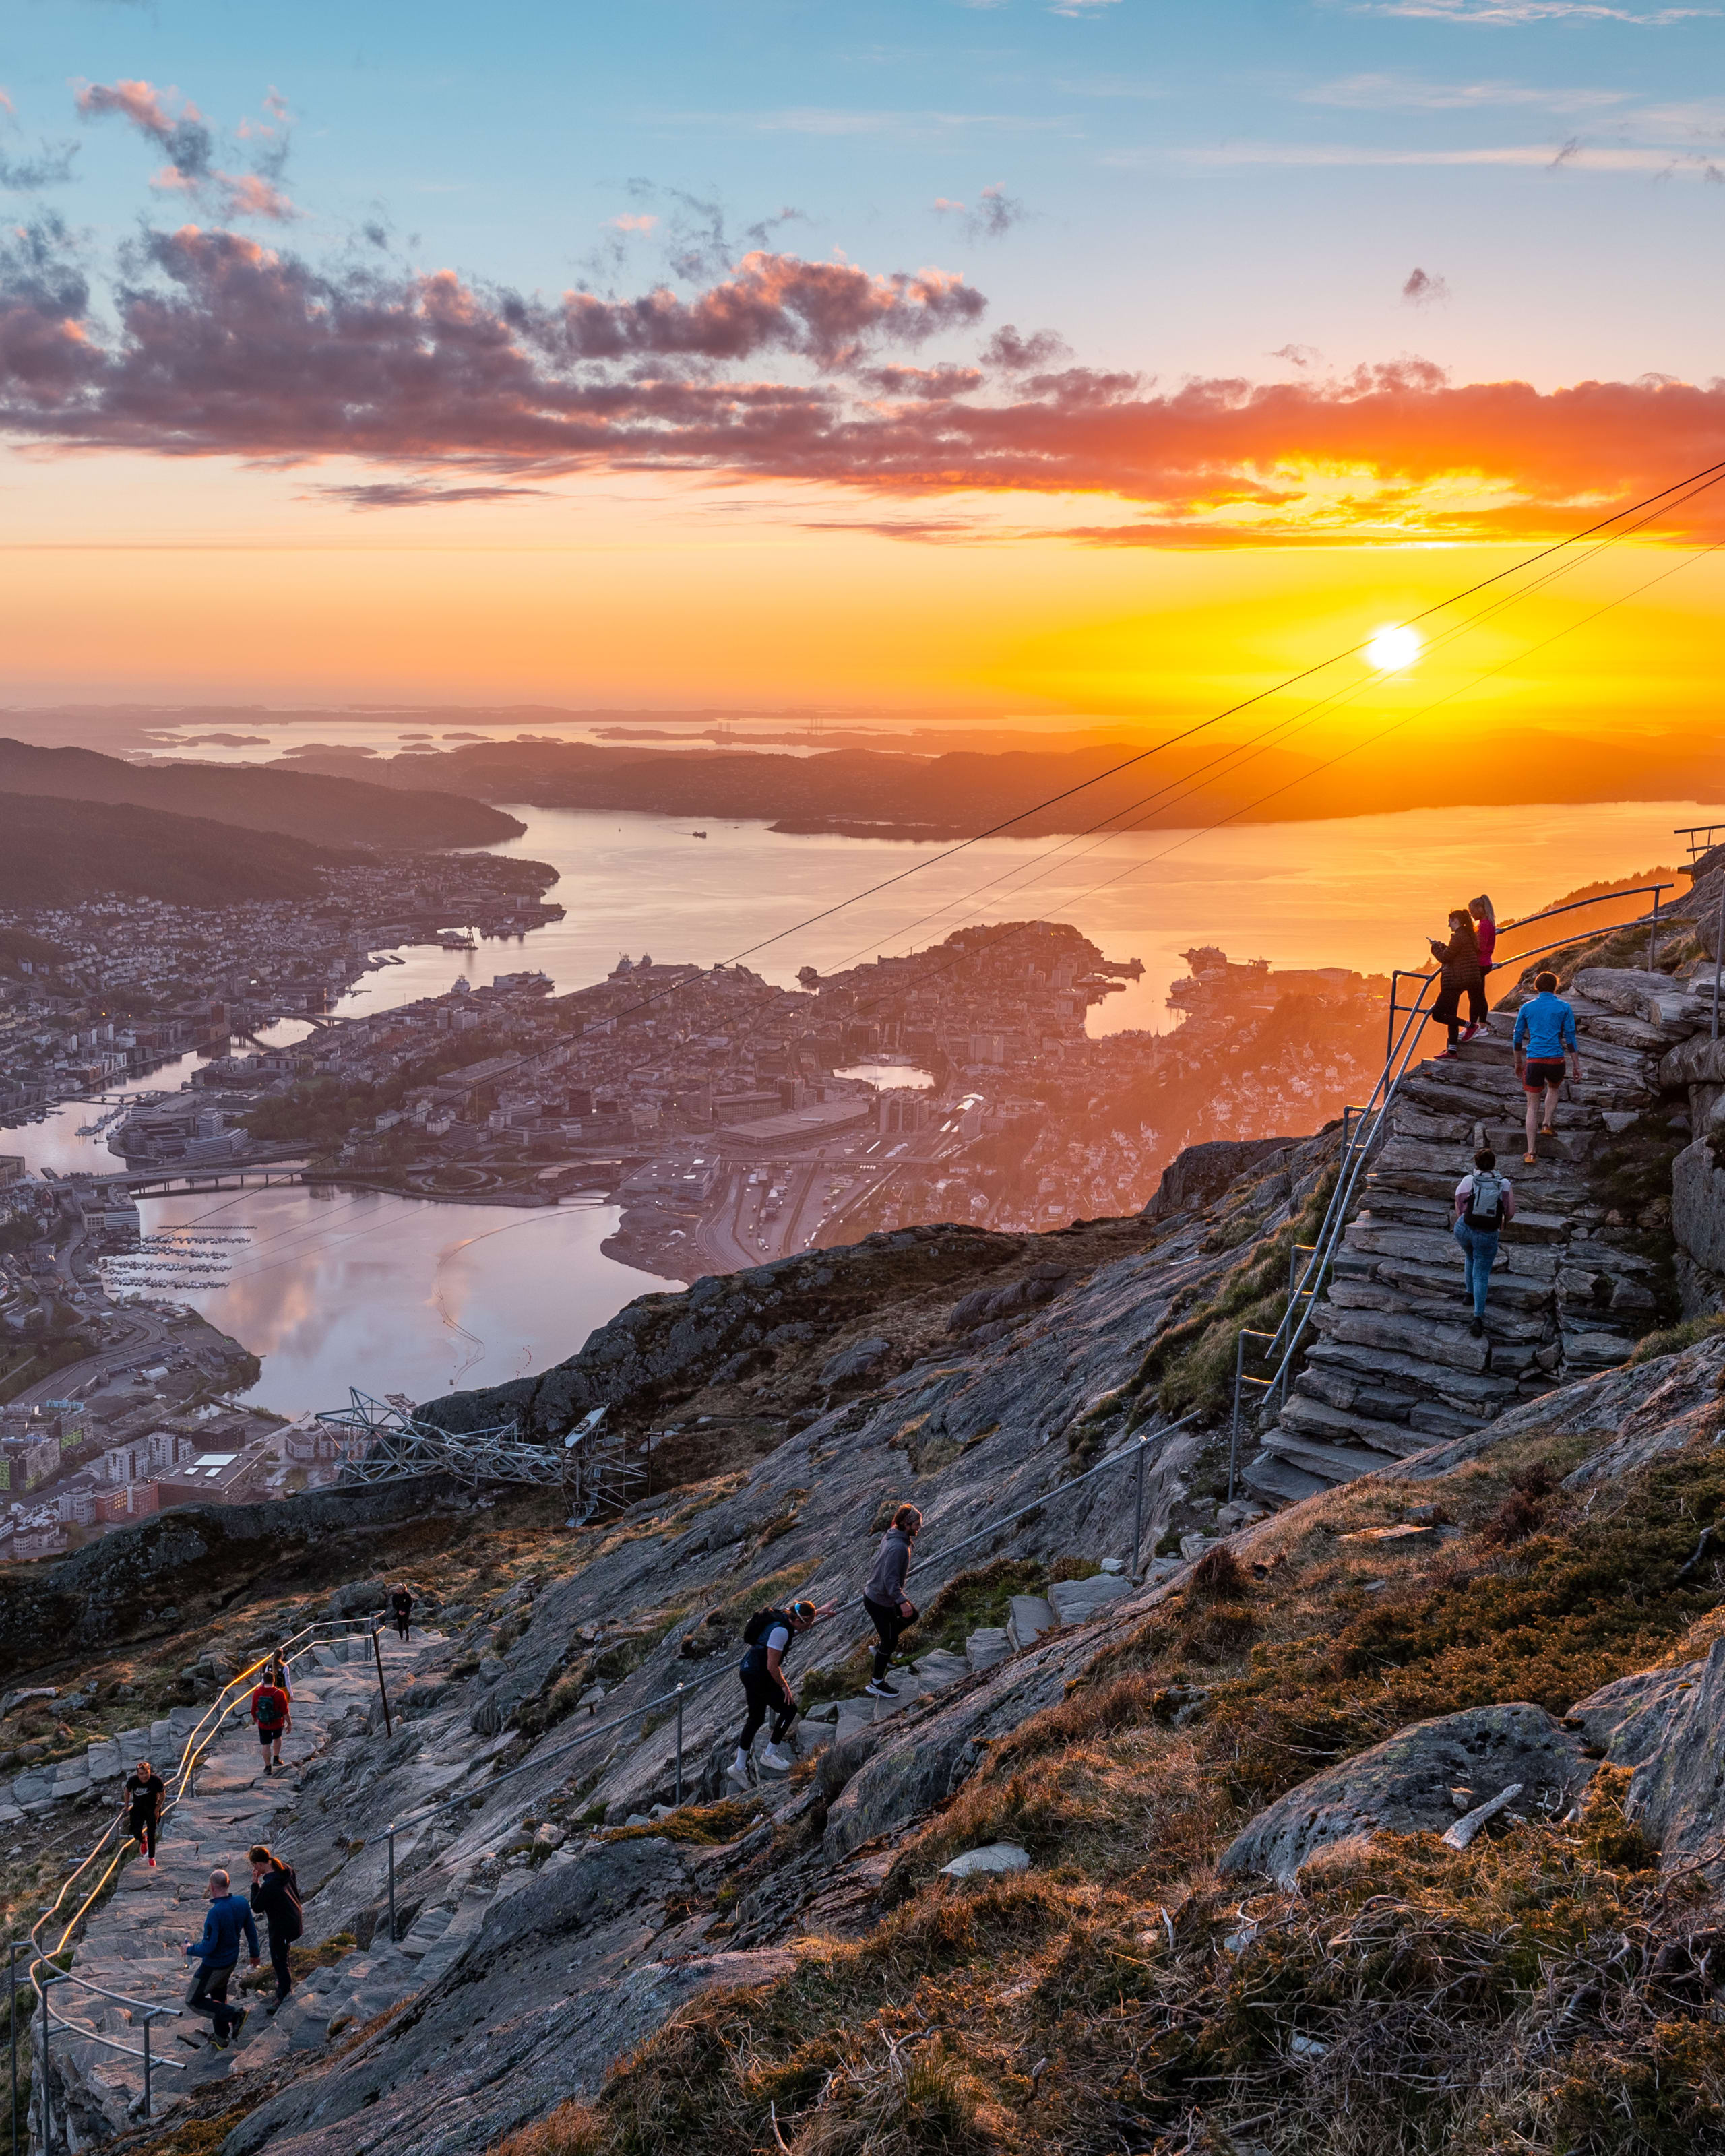 Golden sunset seen from Mount Ulriken in Bergen